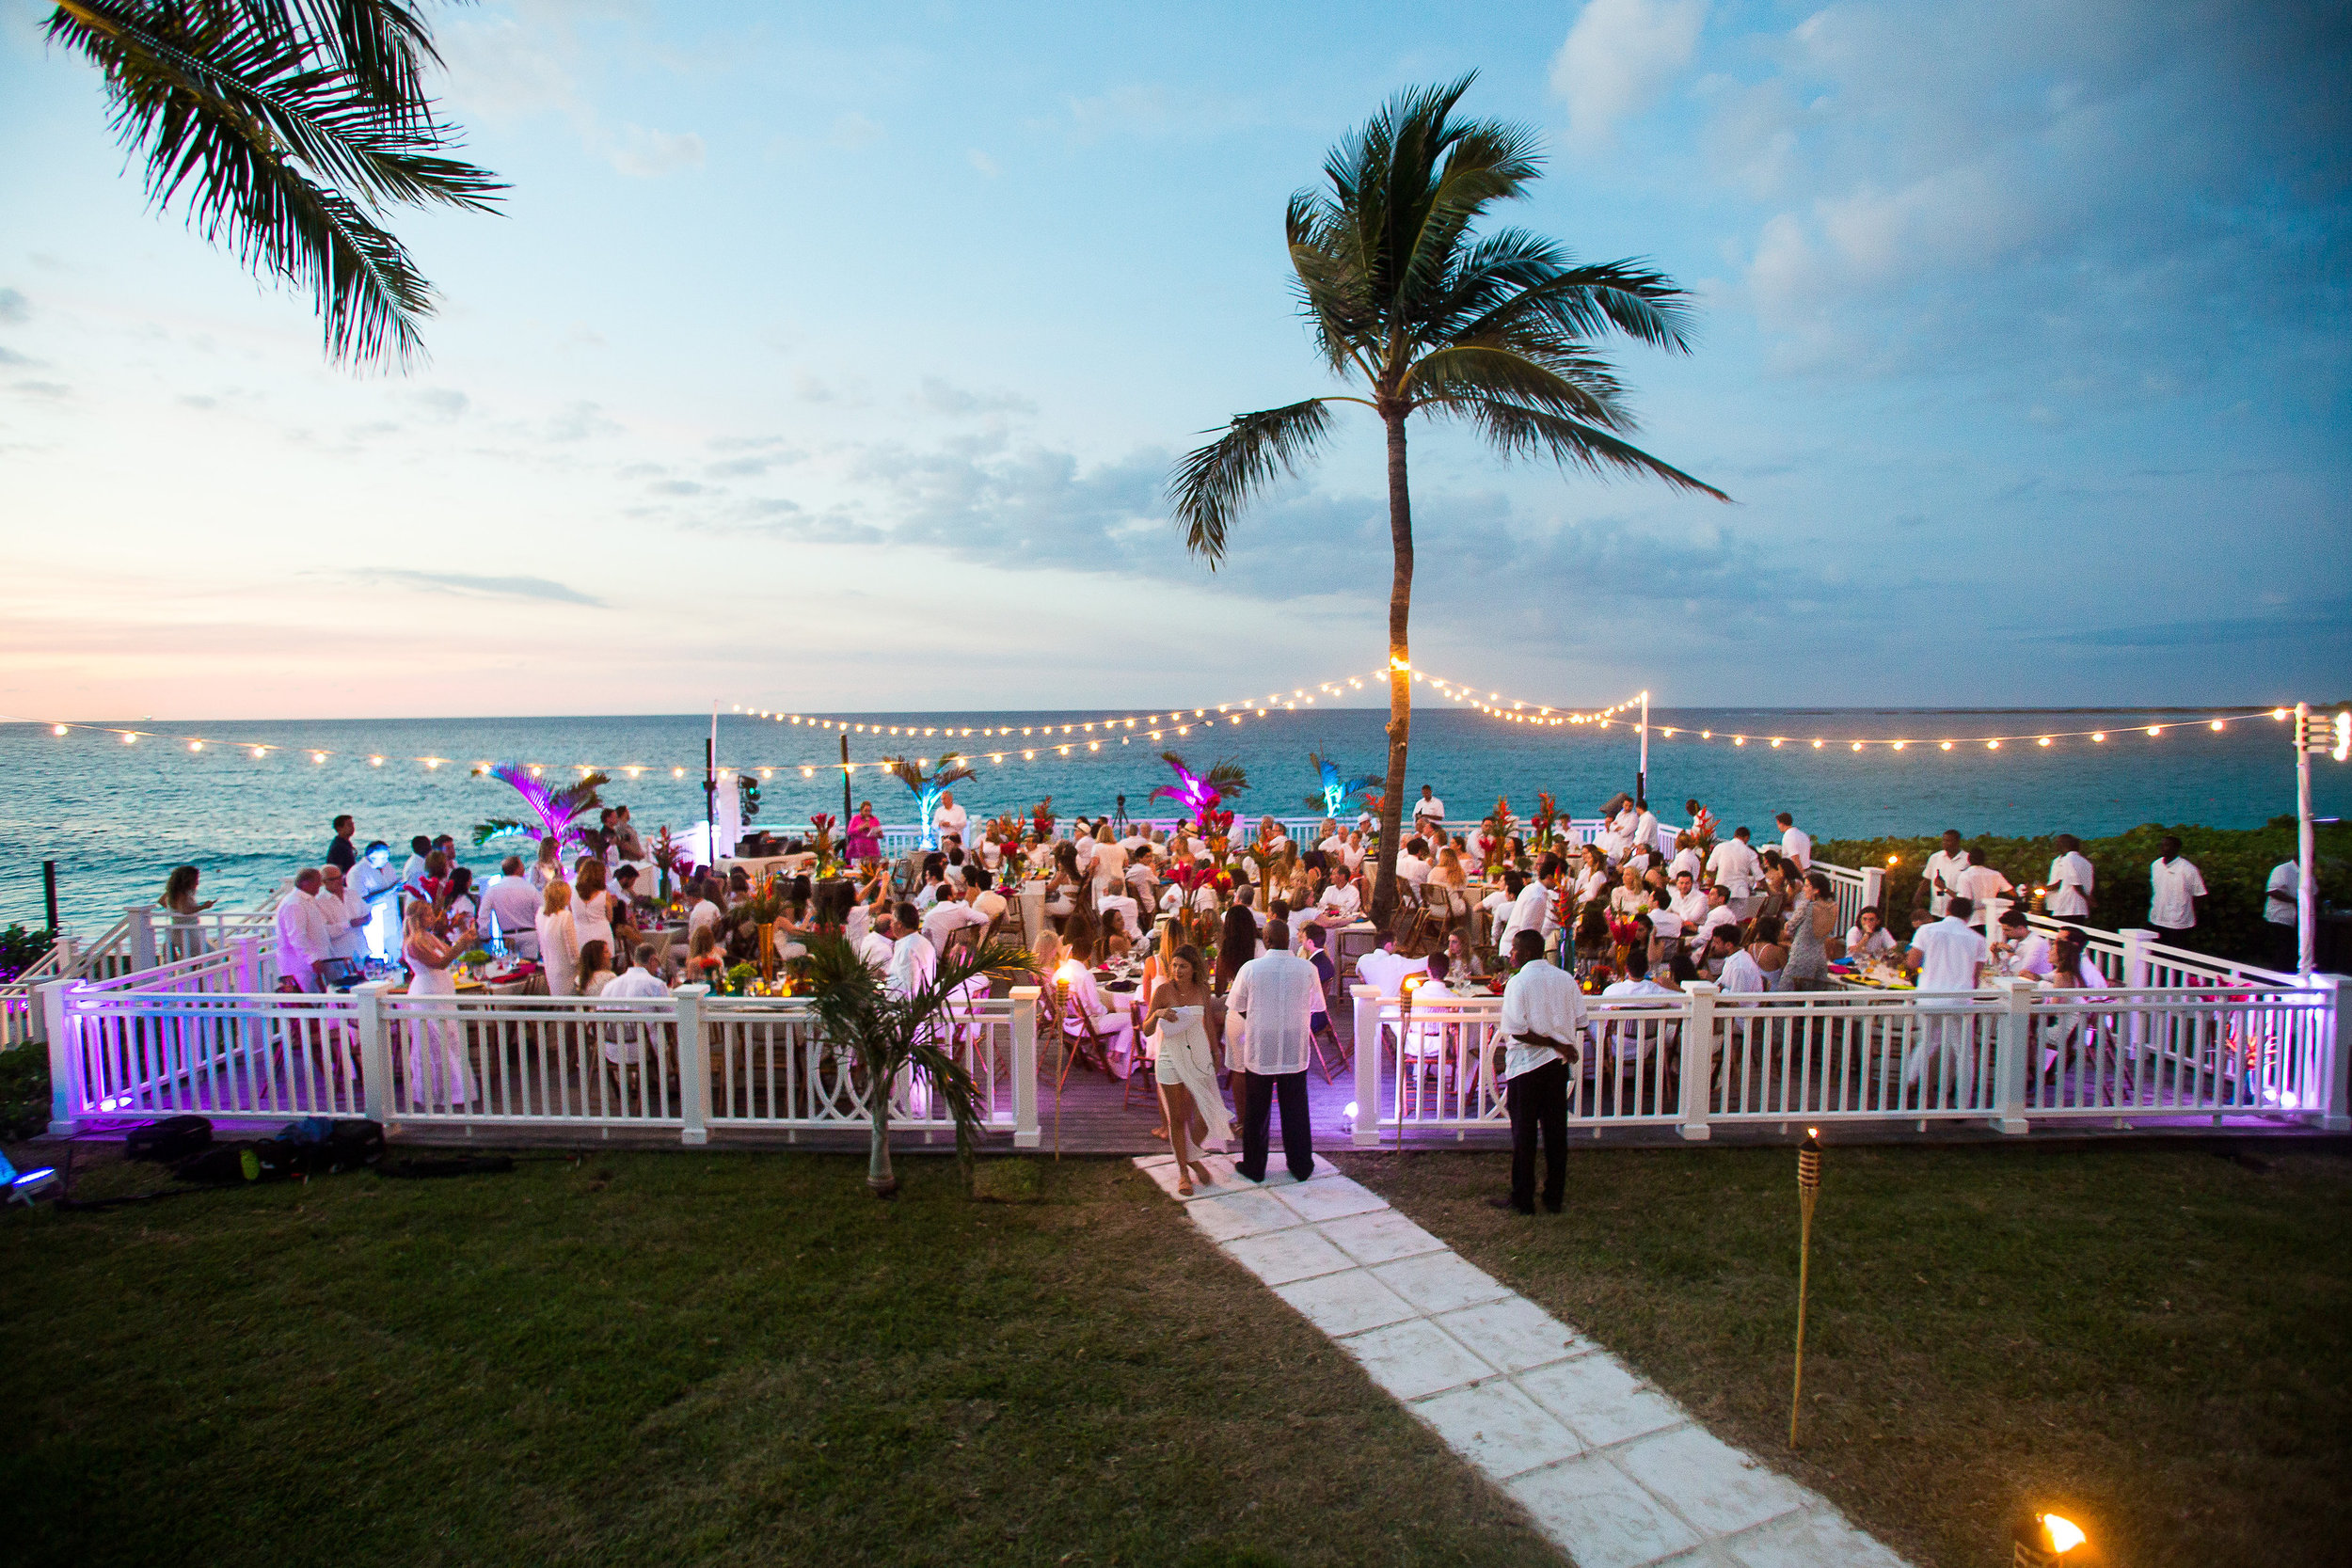 Ceci_New_York_Ceci_Style_Ceci_Johnson_Luxury_Lifestyle_Destination_Bahamas_Wedding_Letterpress_Inspiration_Design_Custom_Couture_Personalized_Invitations_38.jpg